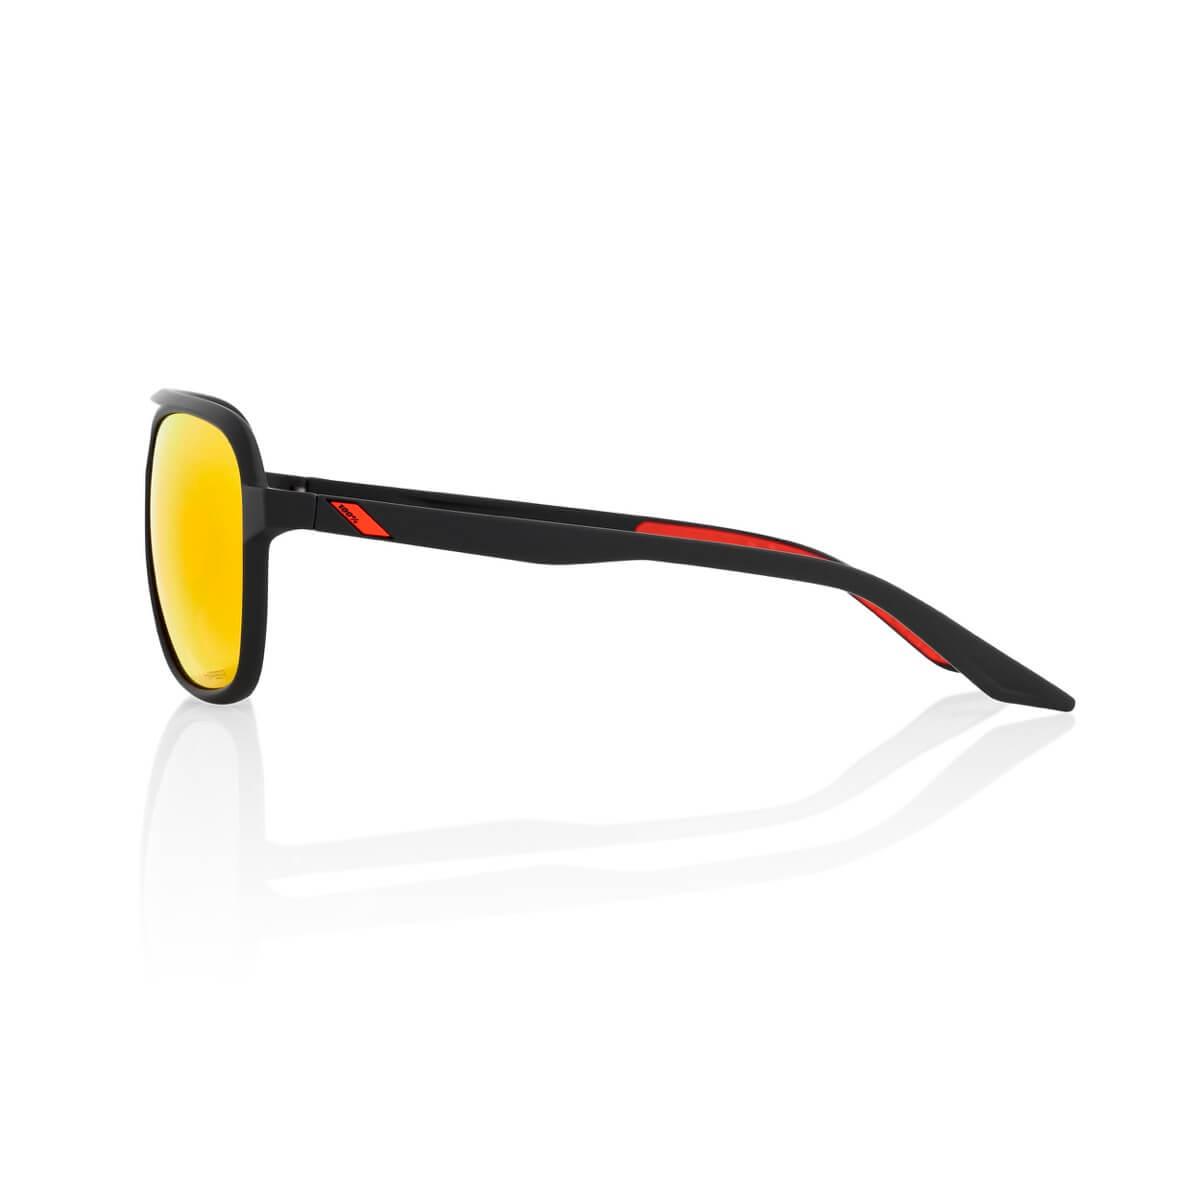 KASIA Aviator Round – Soft Tact Black – HiPER Red Multilayer Mirror Len-